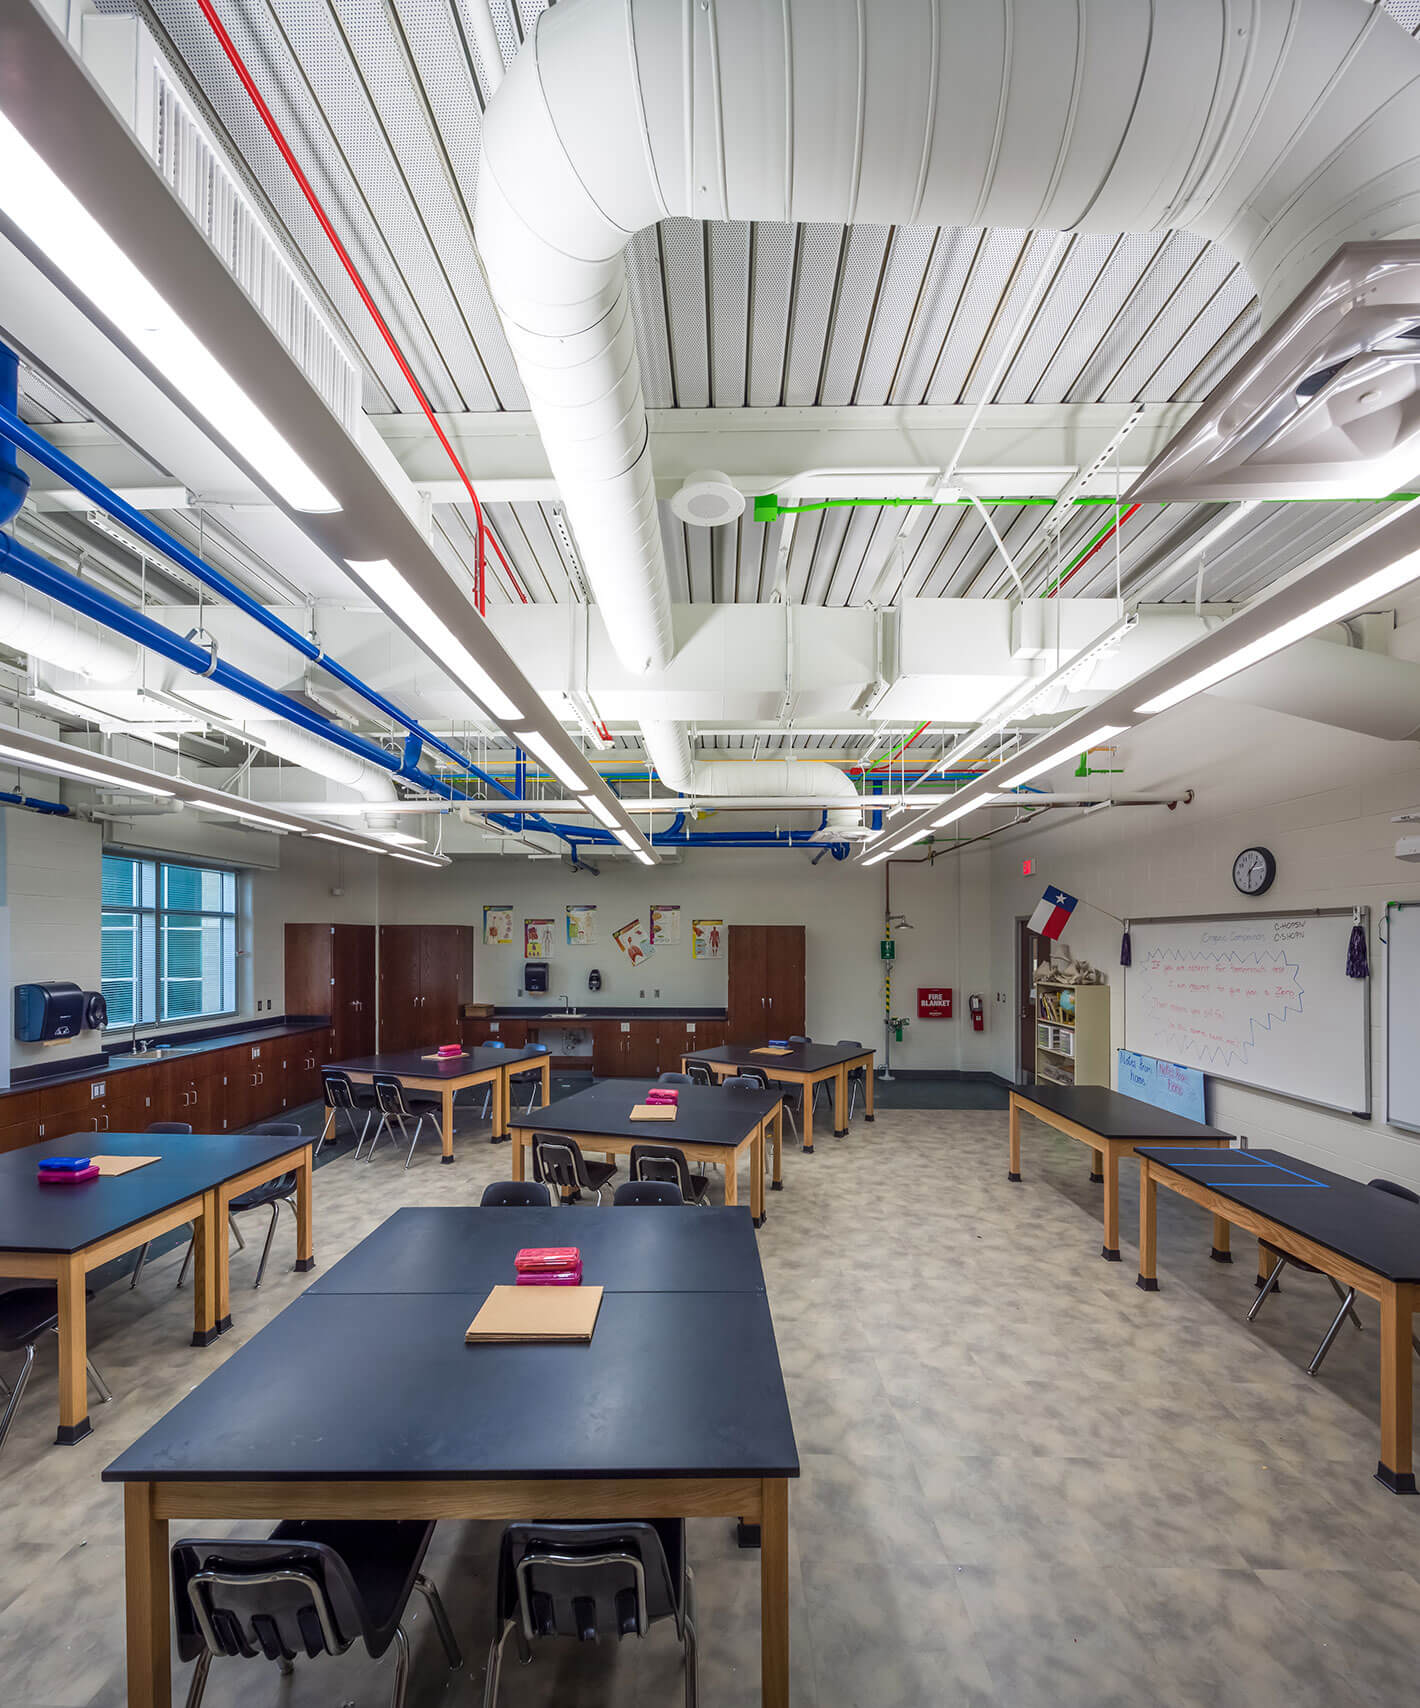 David Anthony Middle School